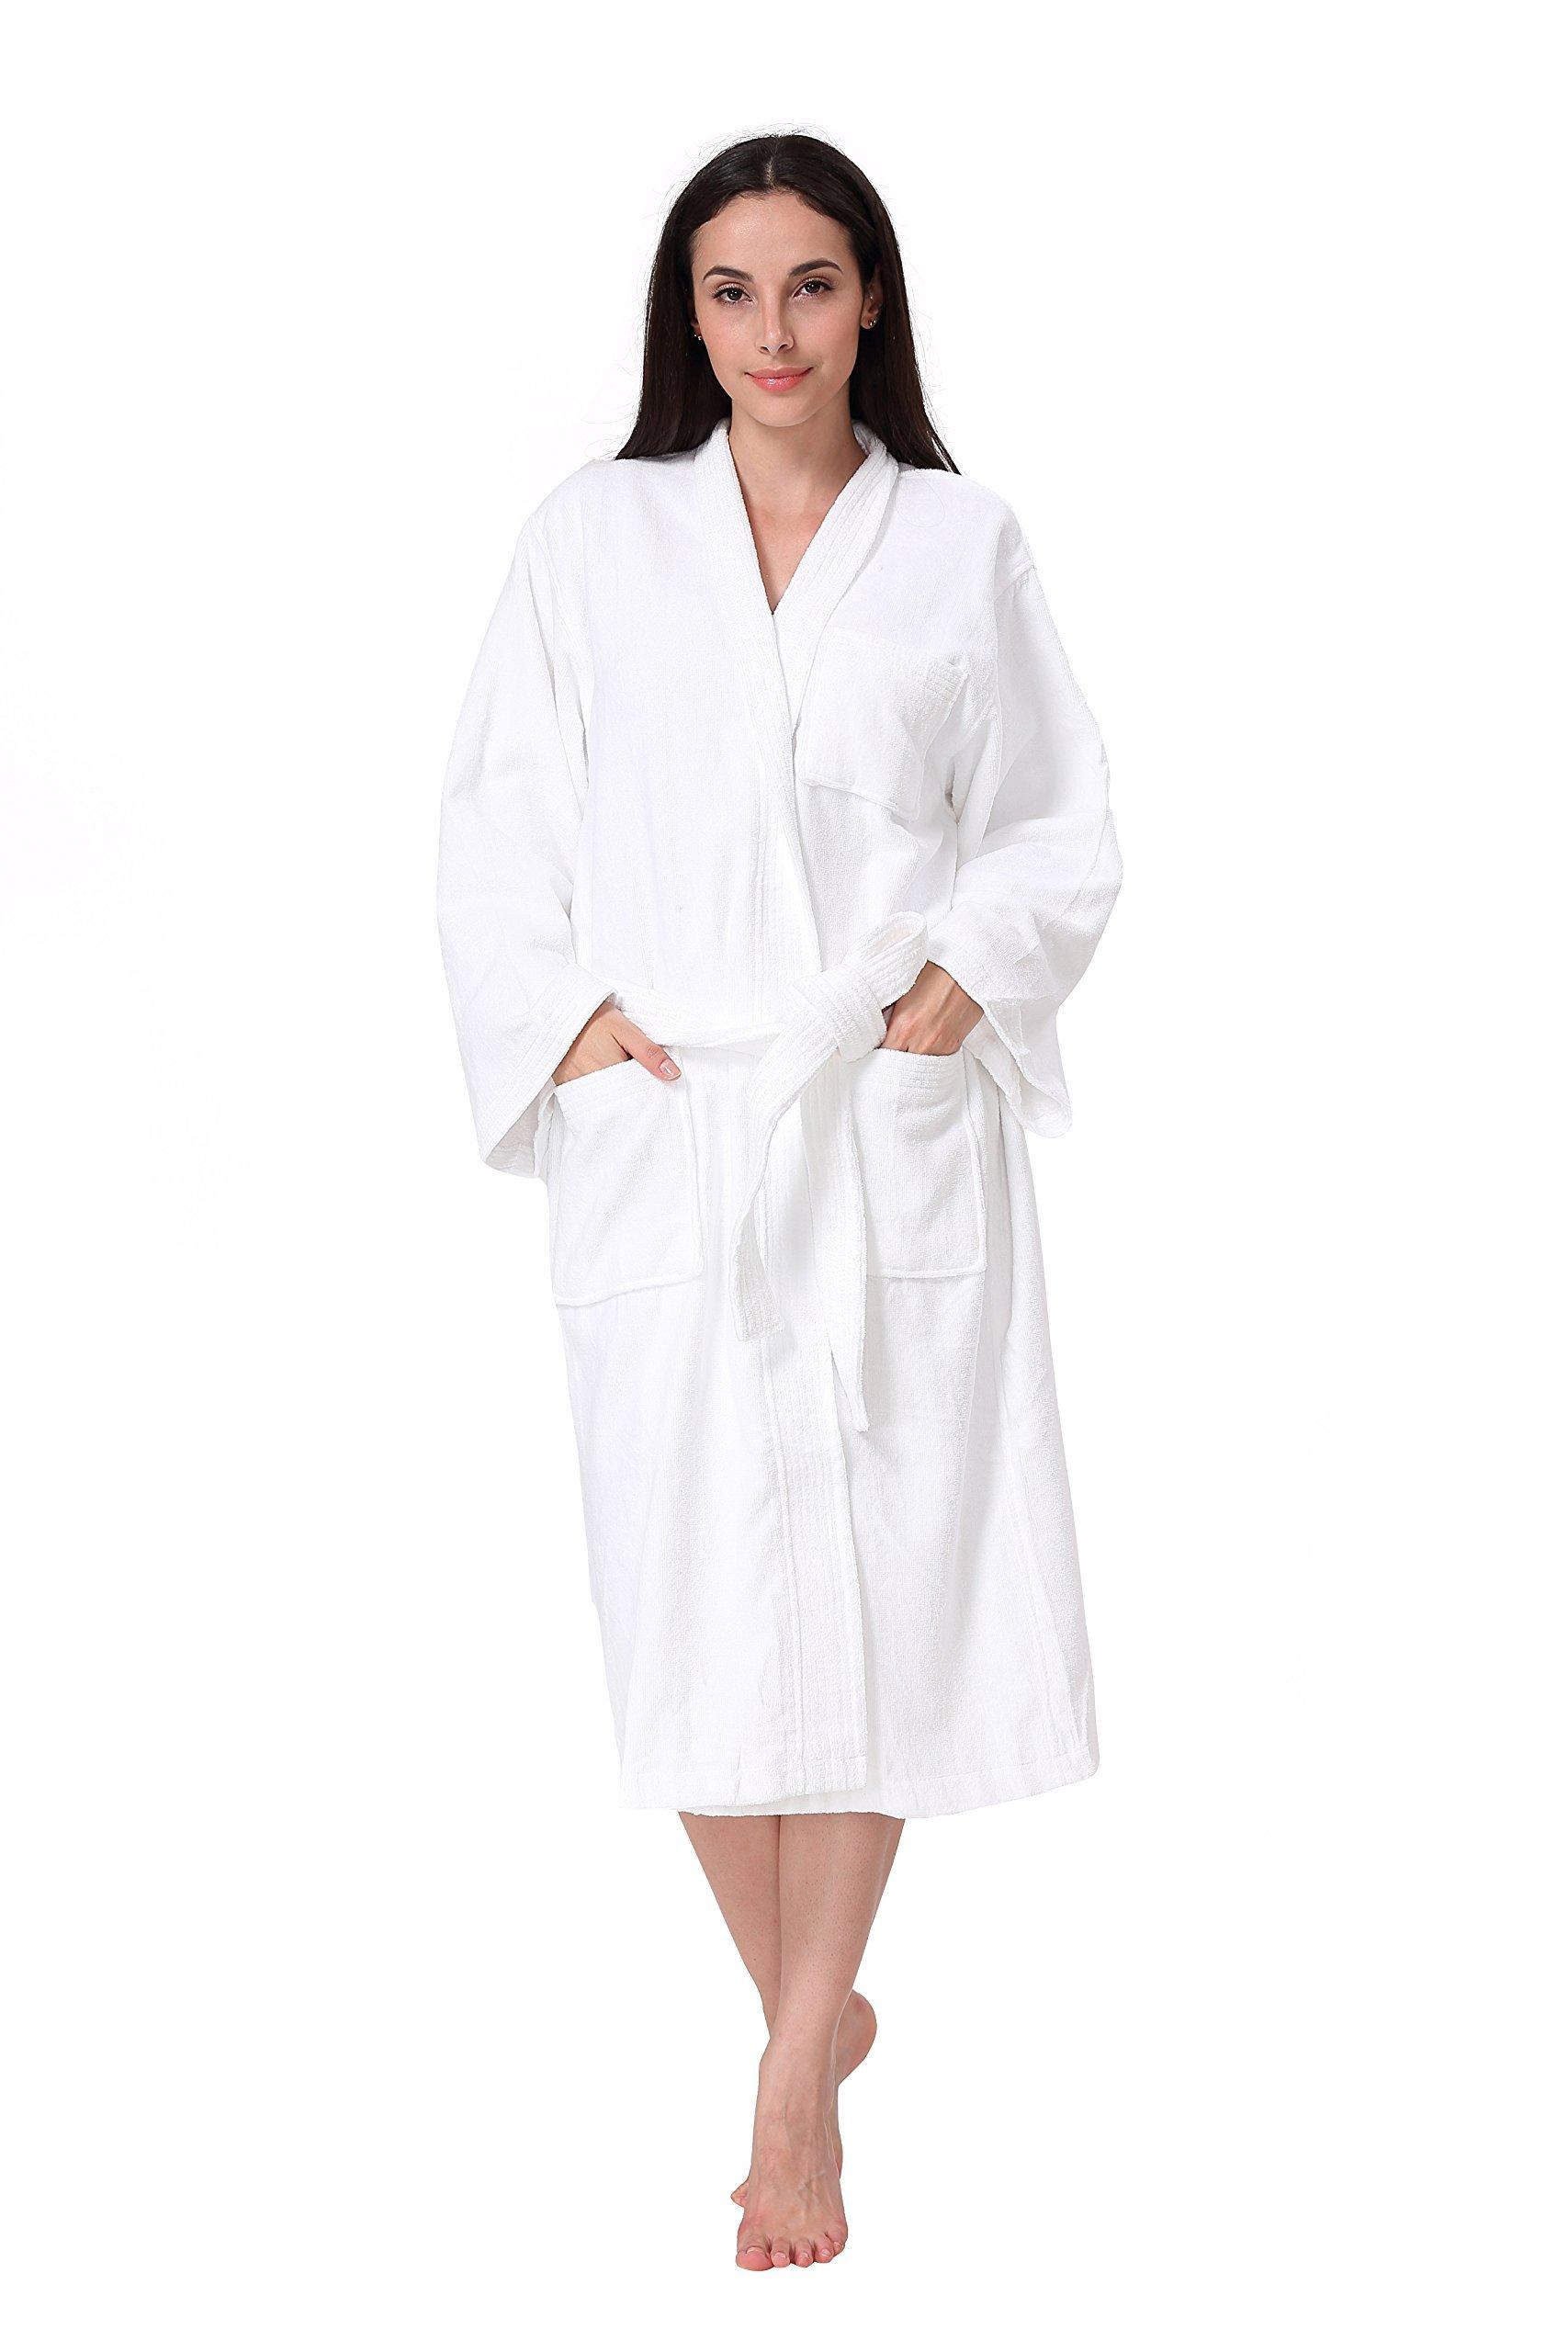 3ca68a1799 Amazon.com  Acanva Women s   Men s Terry Robe Plush Cotton Spa Kimono  Bathrobe